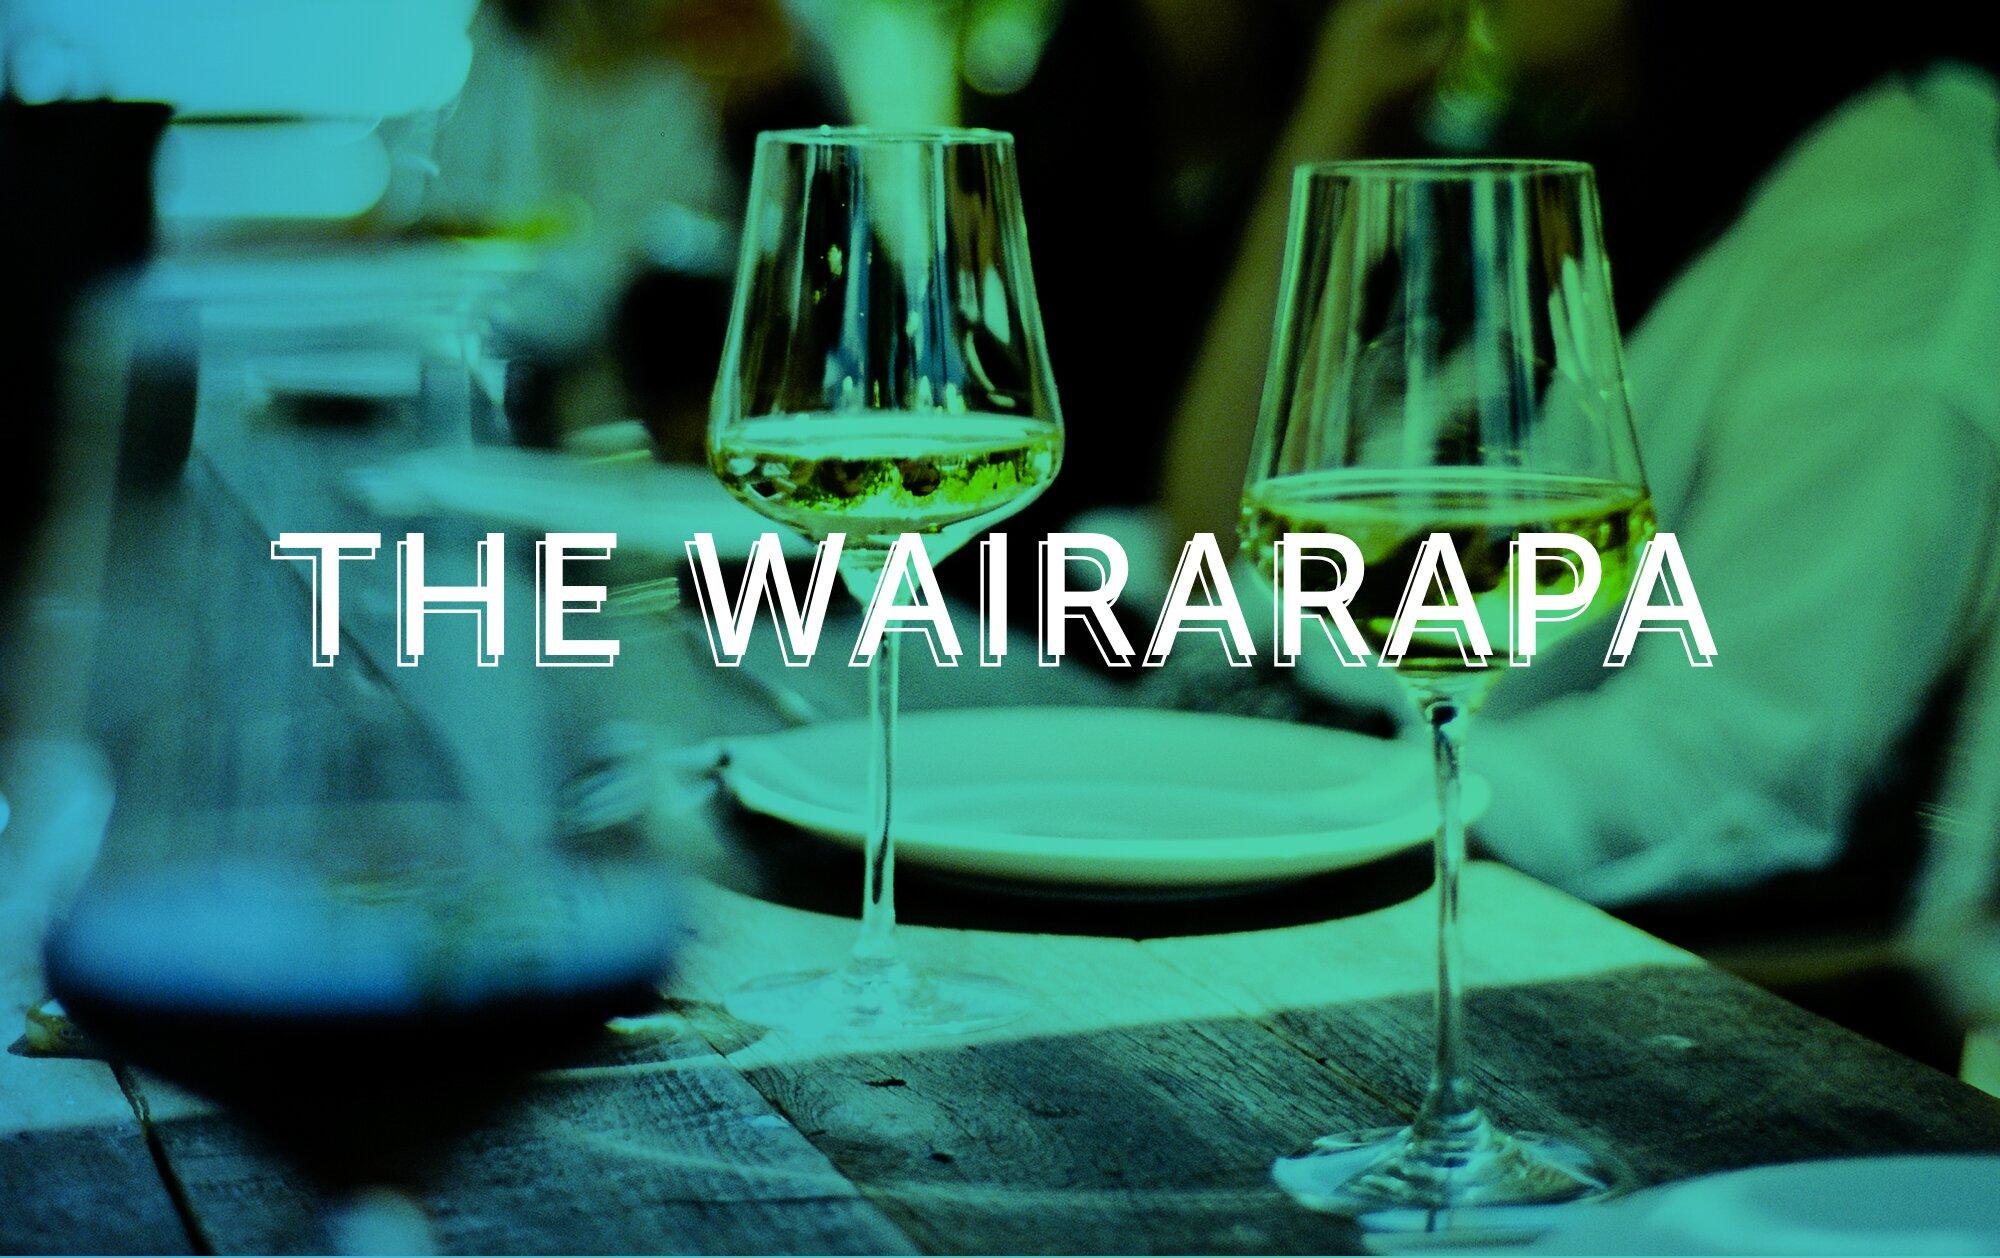 The Wairarapa